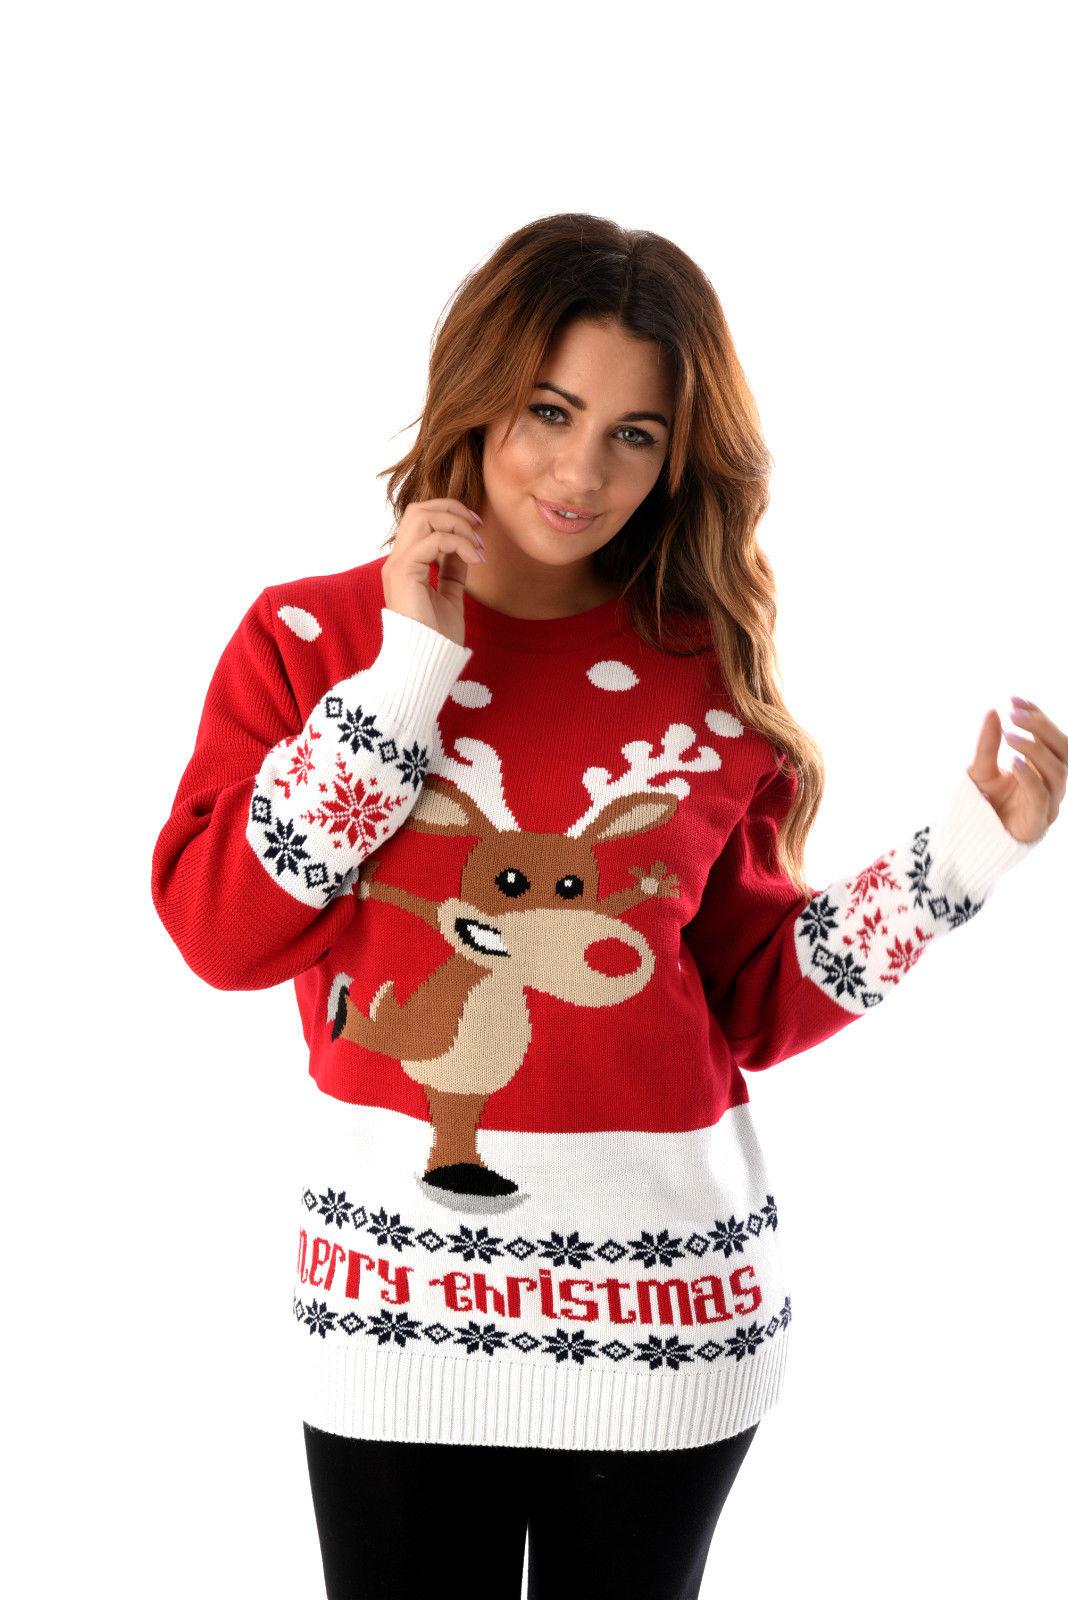 Lelijke Kersttrui Kopen.Lelijke Kersttrui Ugly Christmas Sweater Kersttrui Com